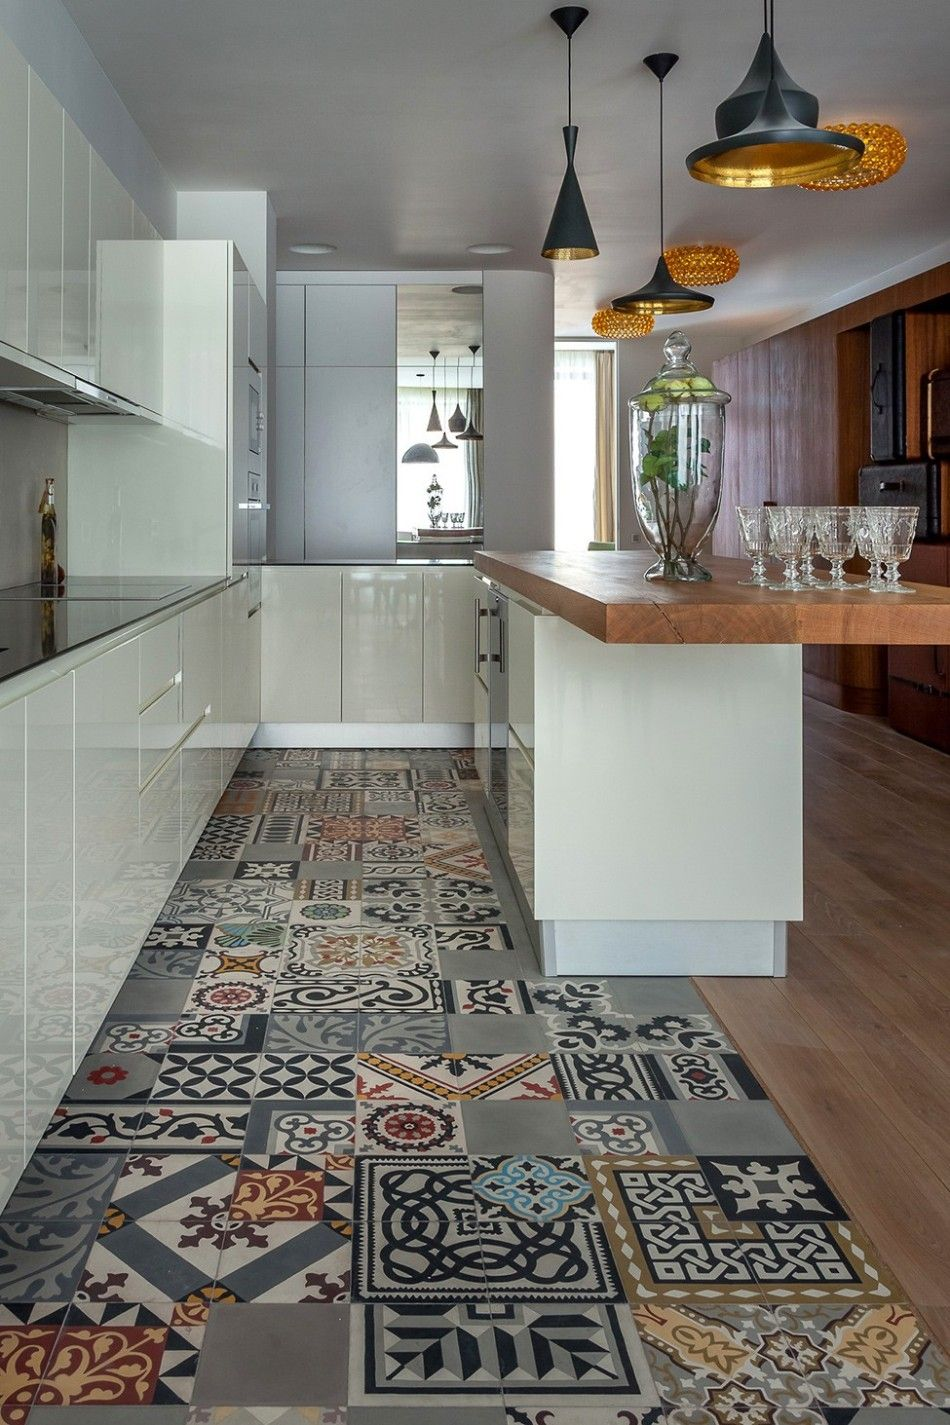 Funky kitchen floor tile design, decor, interior, home   Kitchen ...